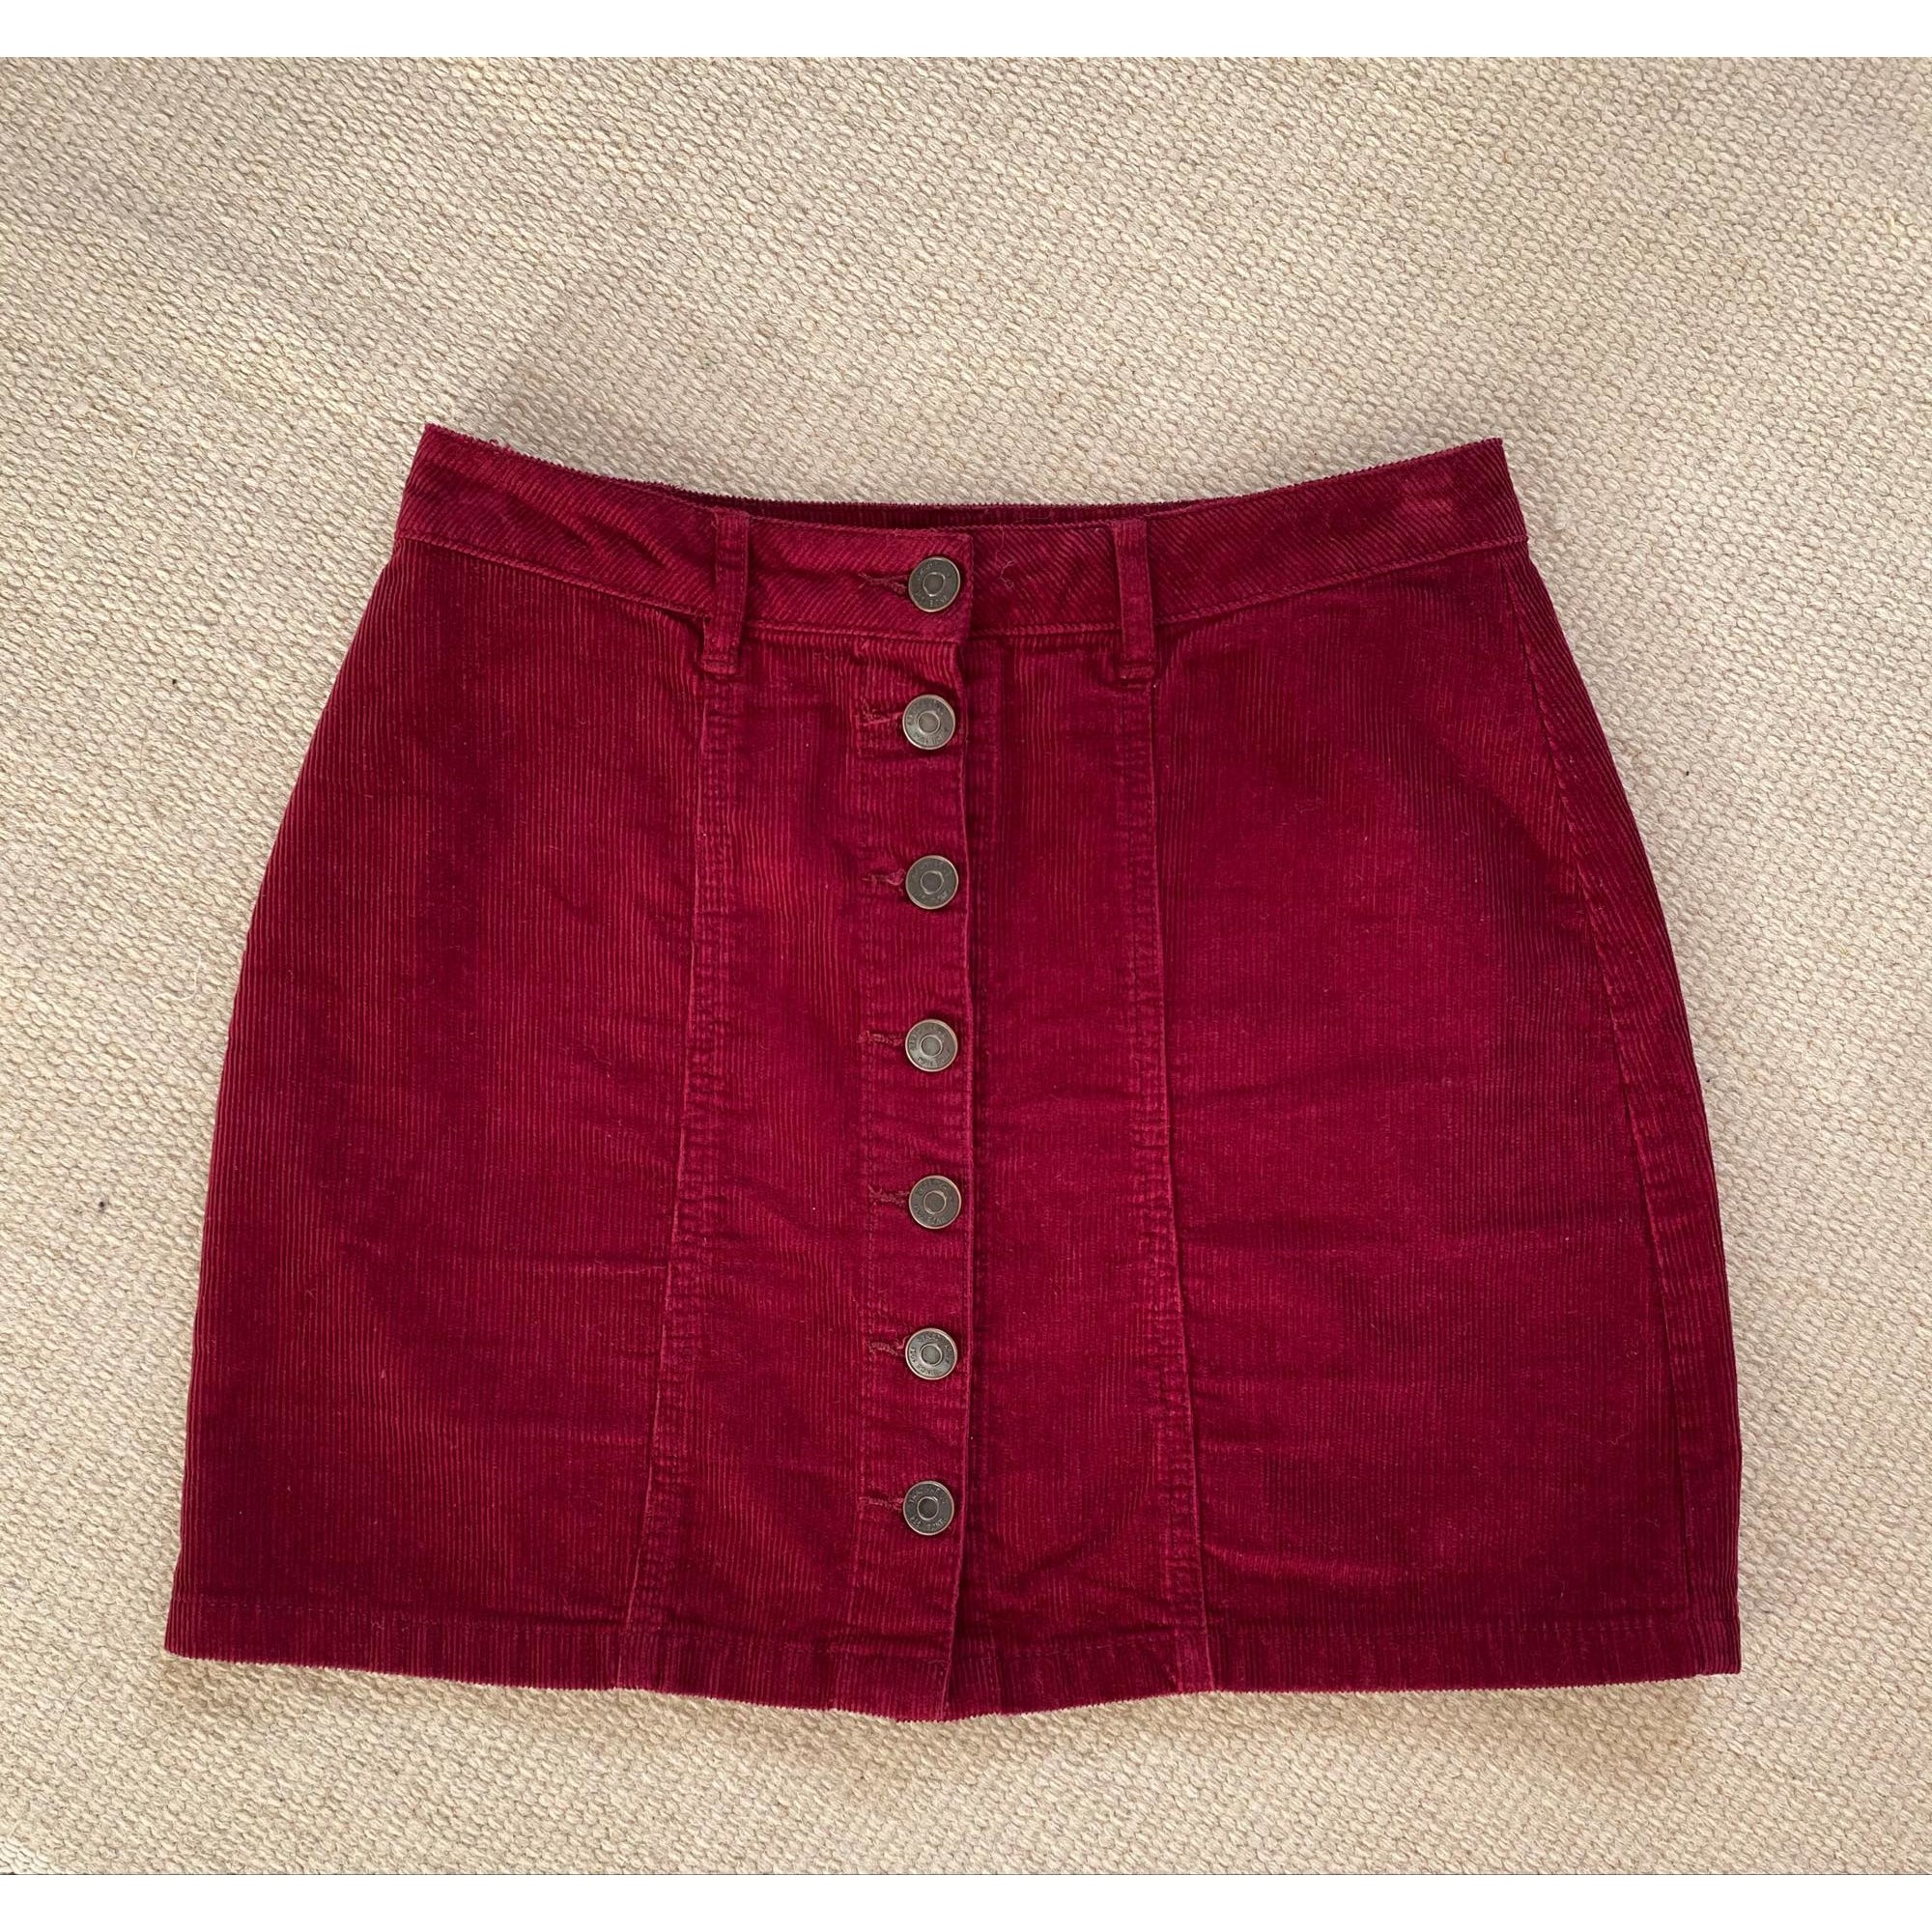 Jupe courte STRADIVARIUS Rouge, bordeaux